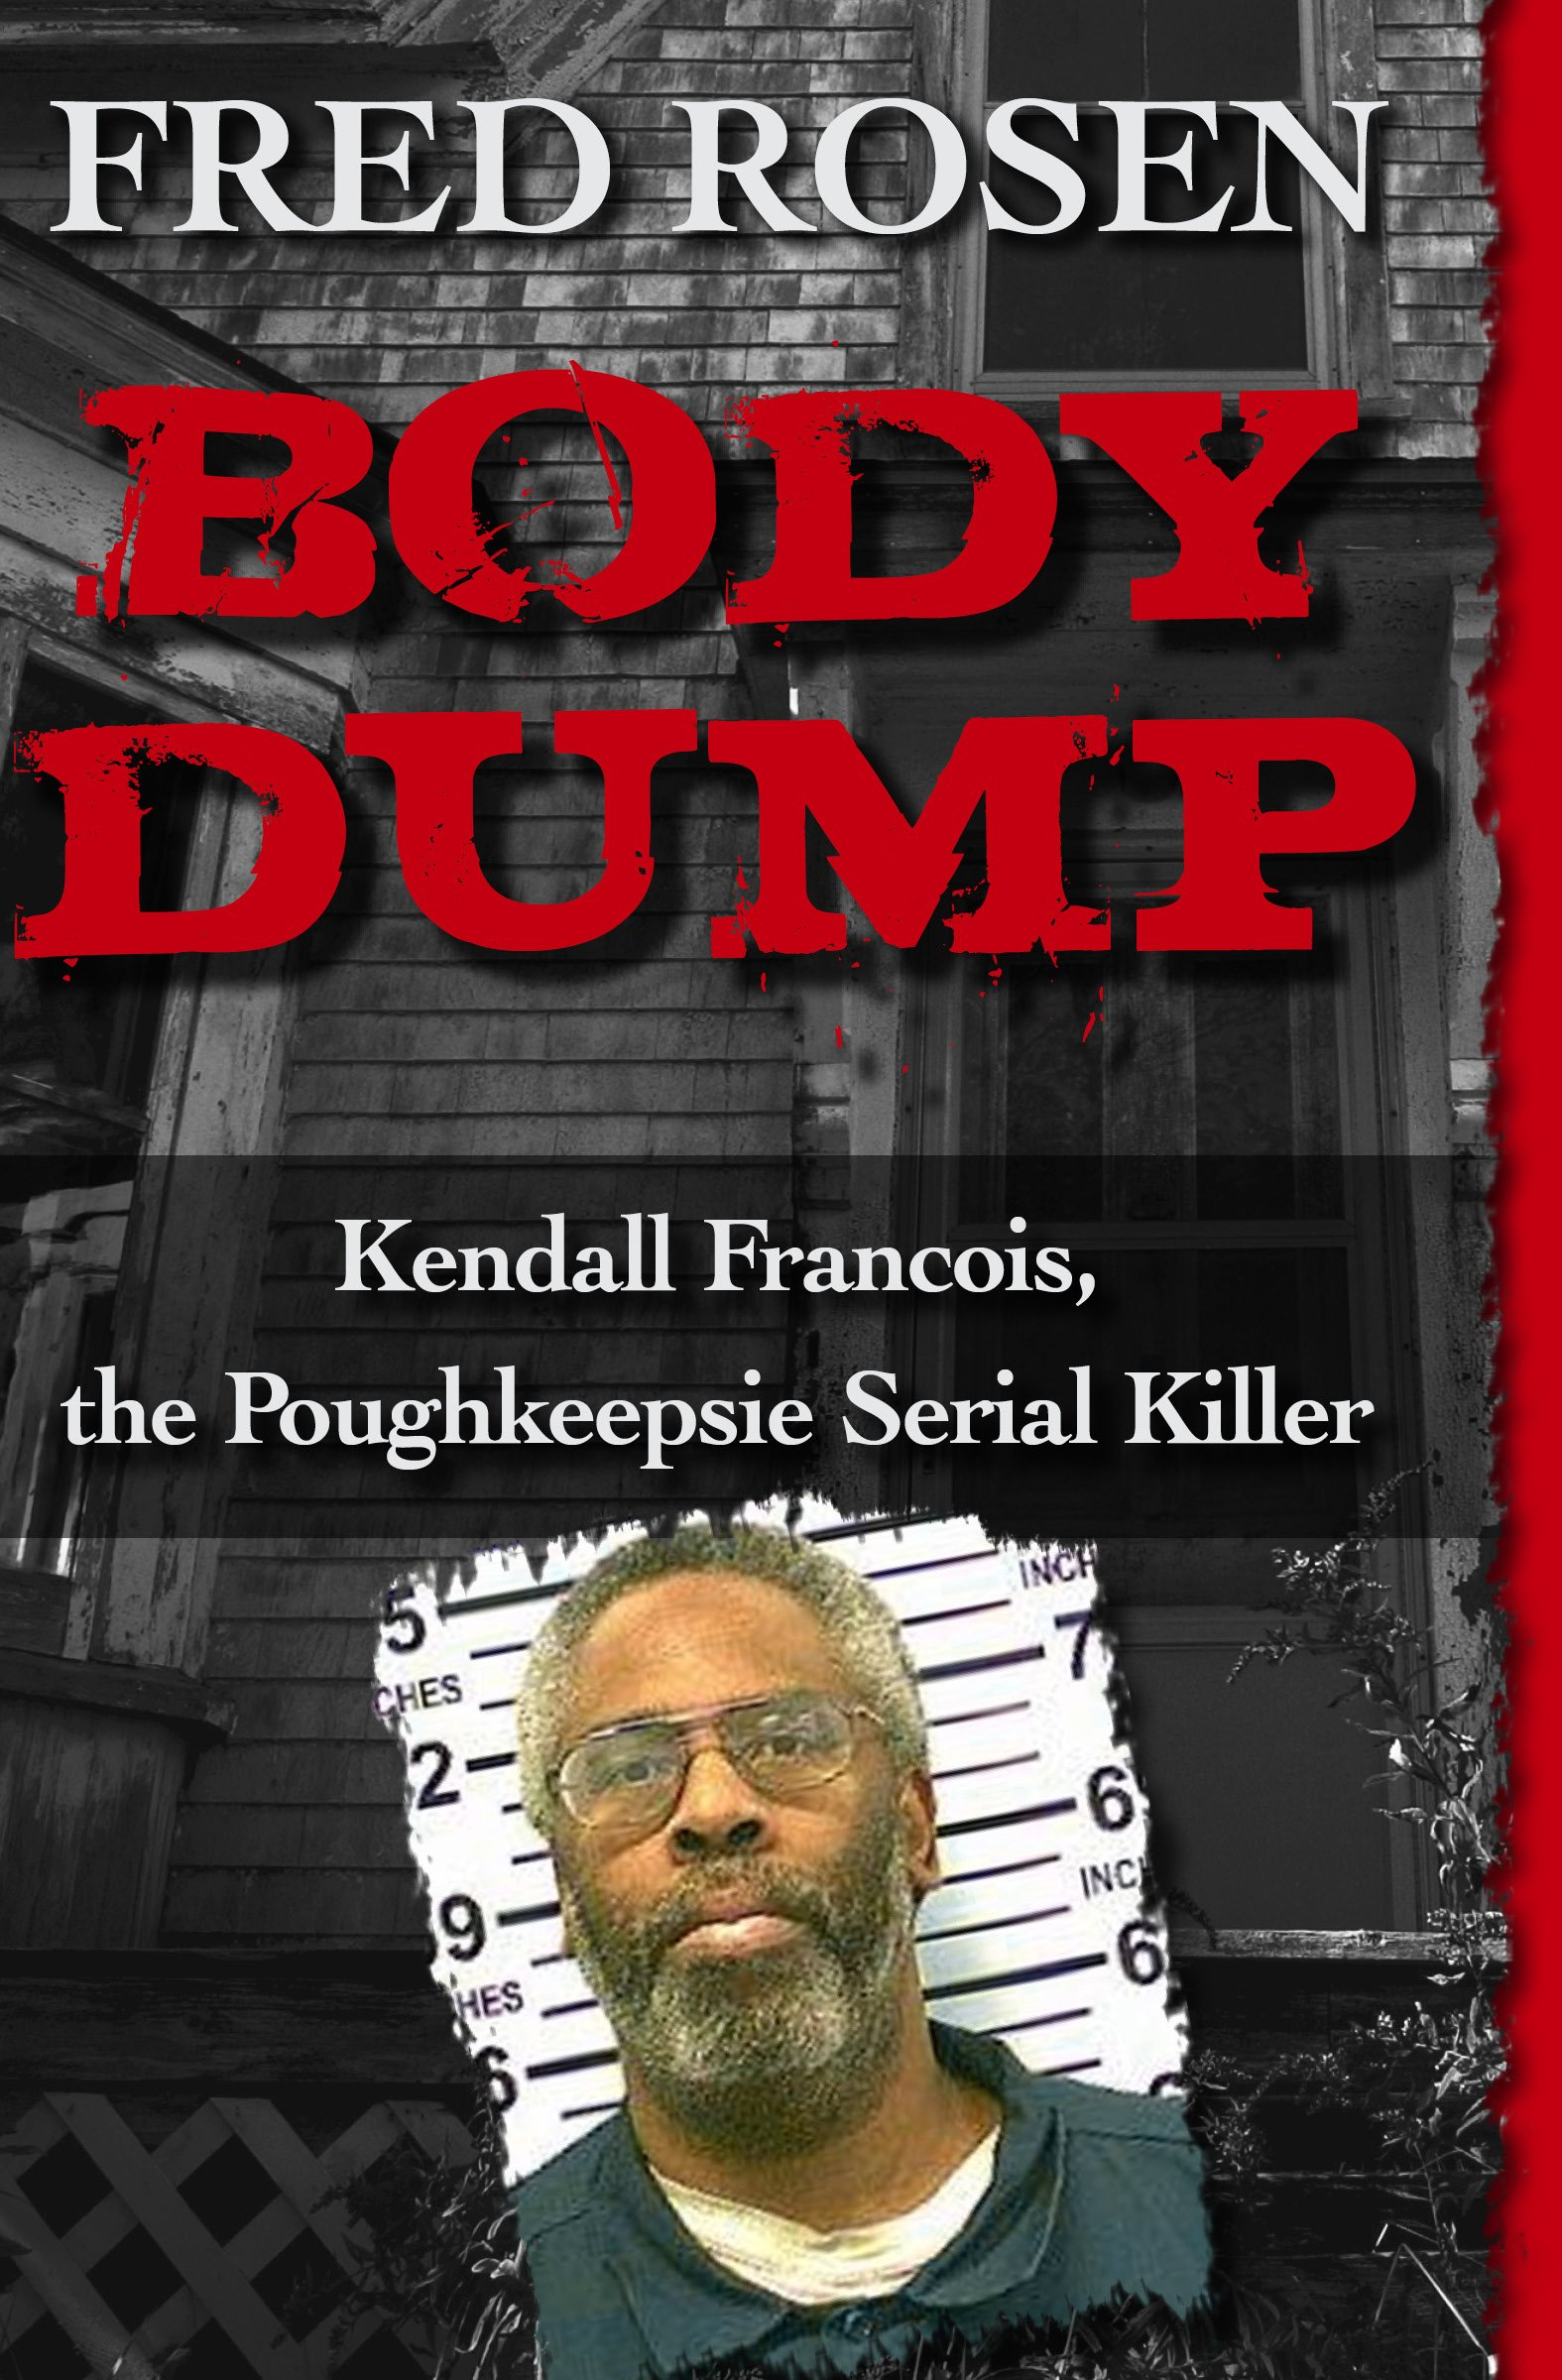 poughkeepsie killer biography